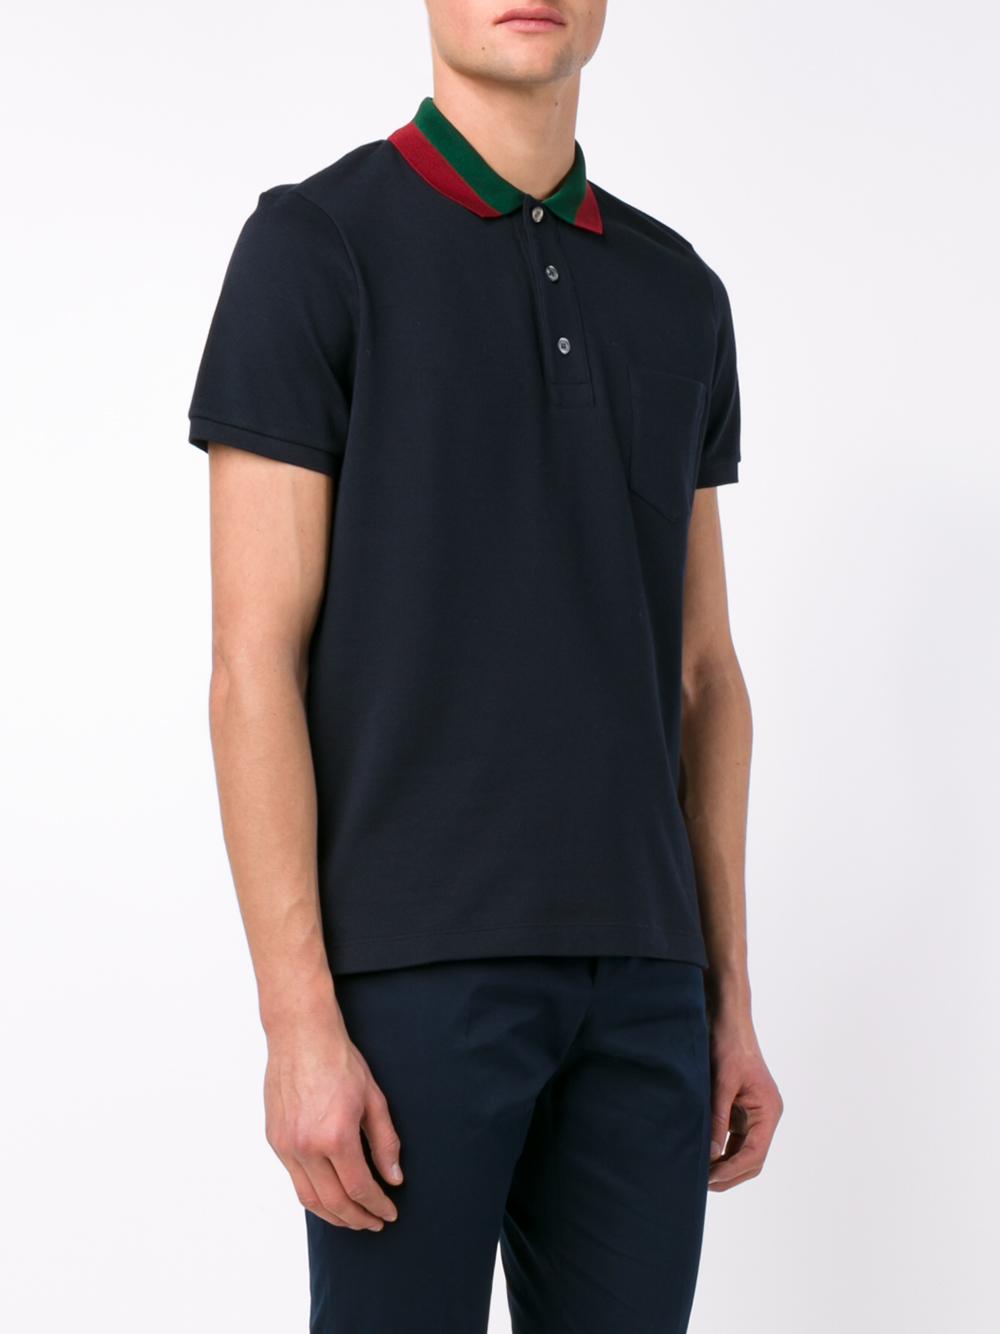 543fdb38b Gucci Striped Collar Polo T-shirt in Blue for Men - Lyst